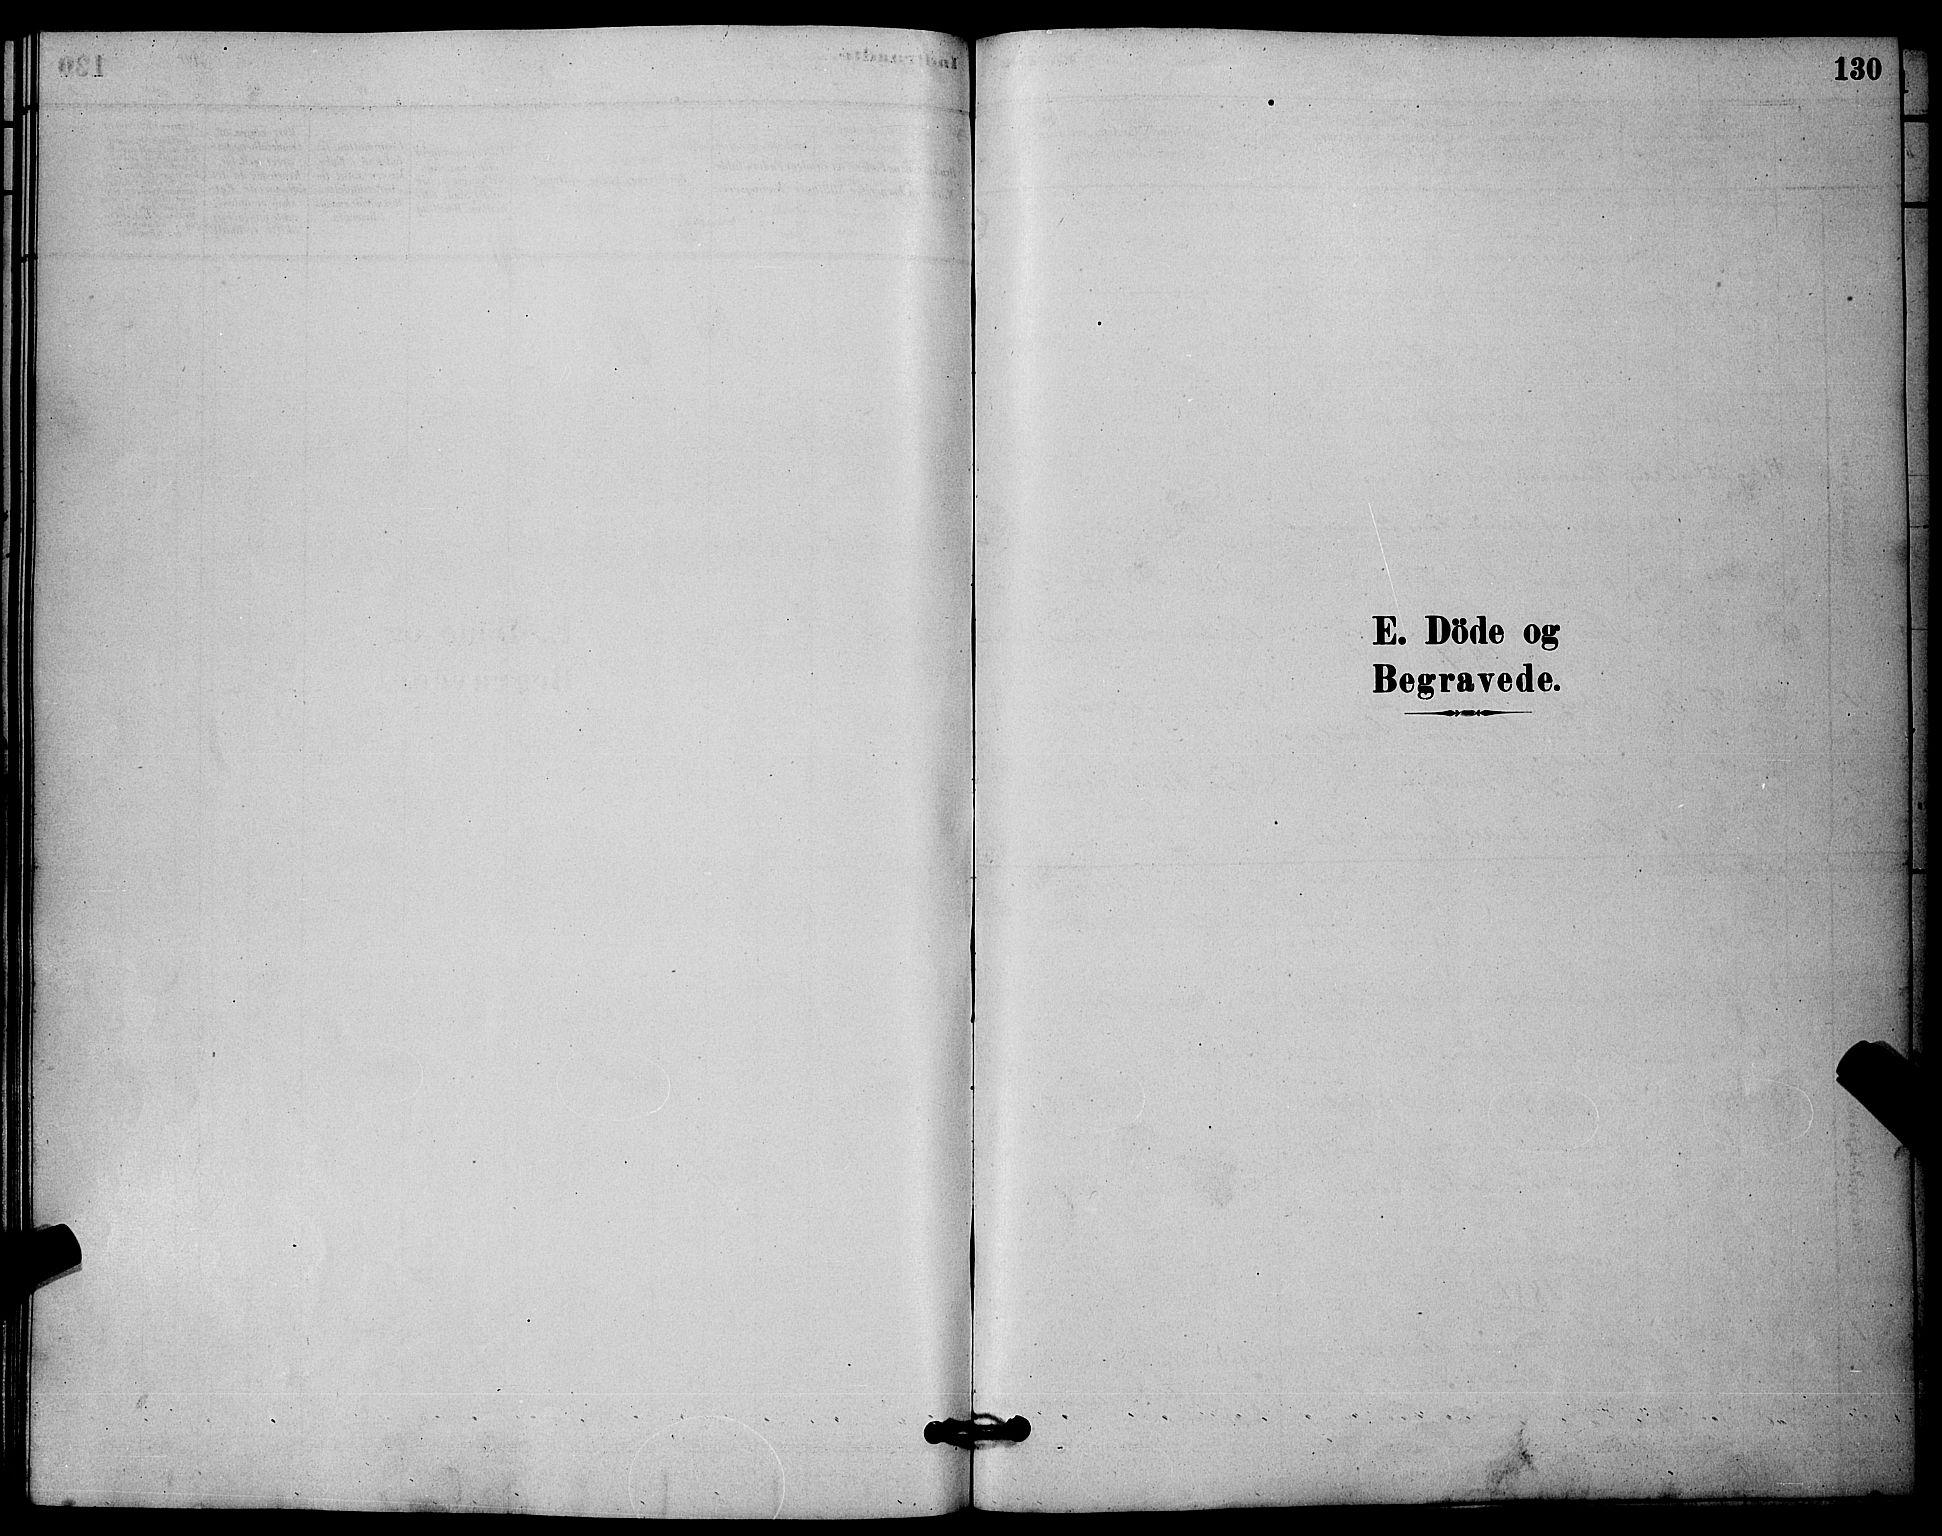 SAKO, Solum kirkebøker, G/Gb/L0003: Klokkerbok nr. II 3, 1880-1898, s. 130